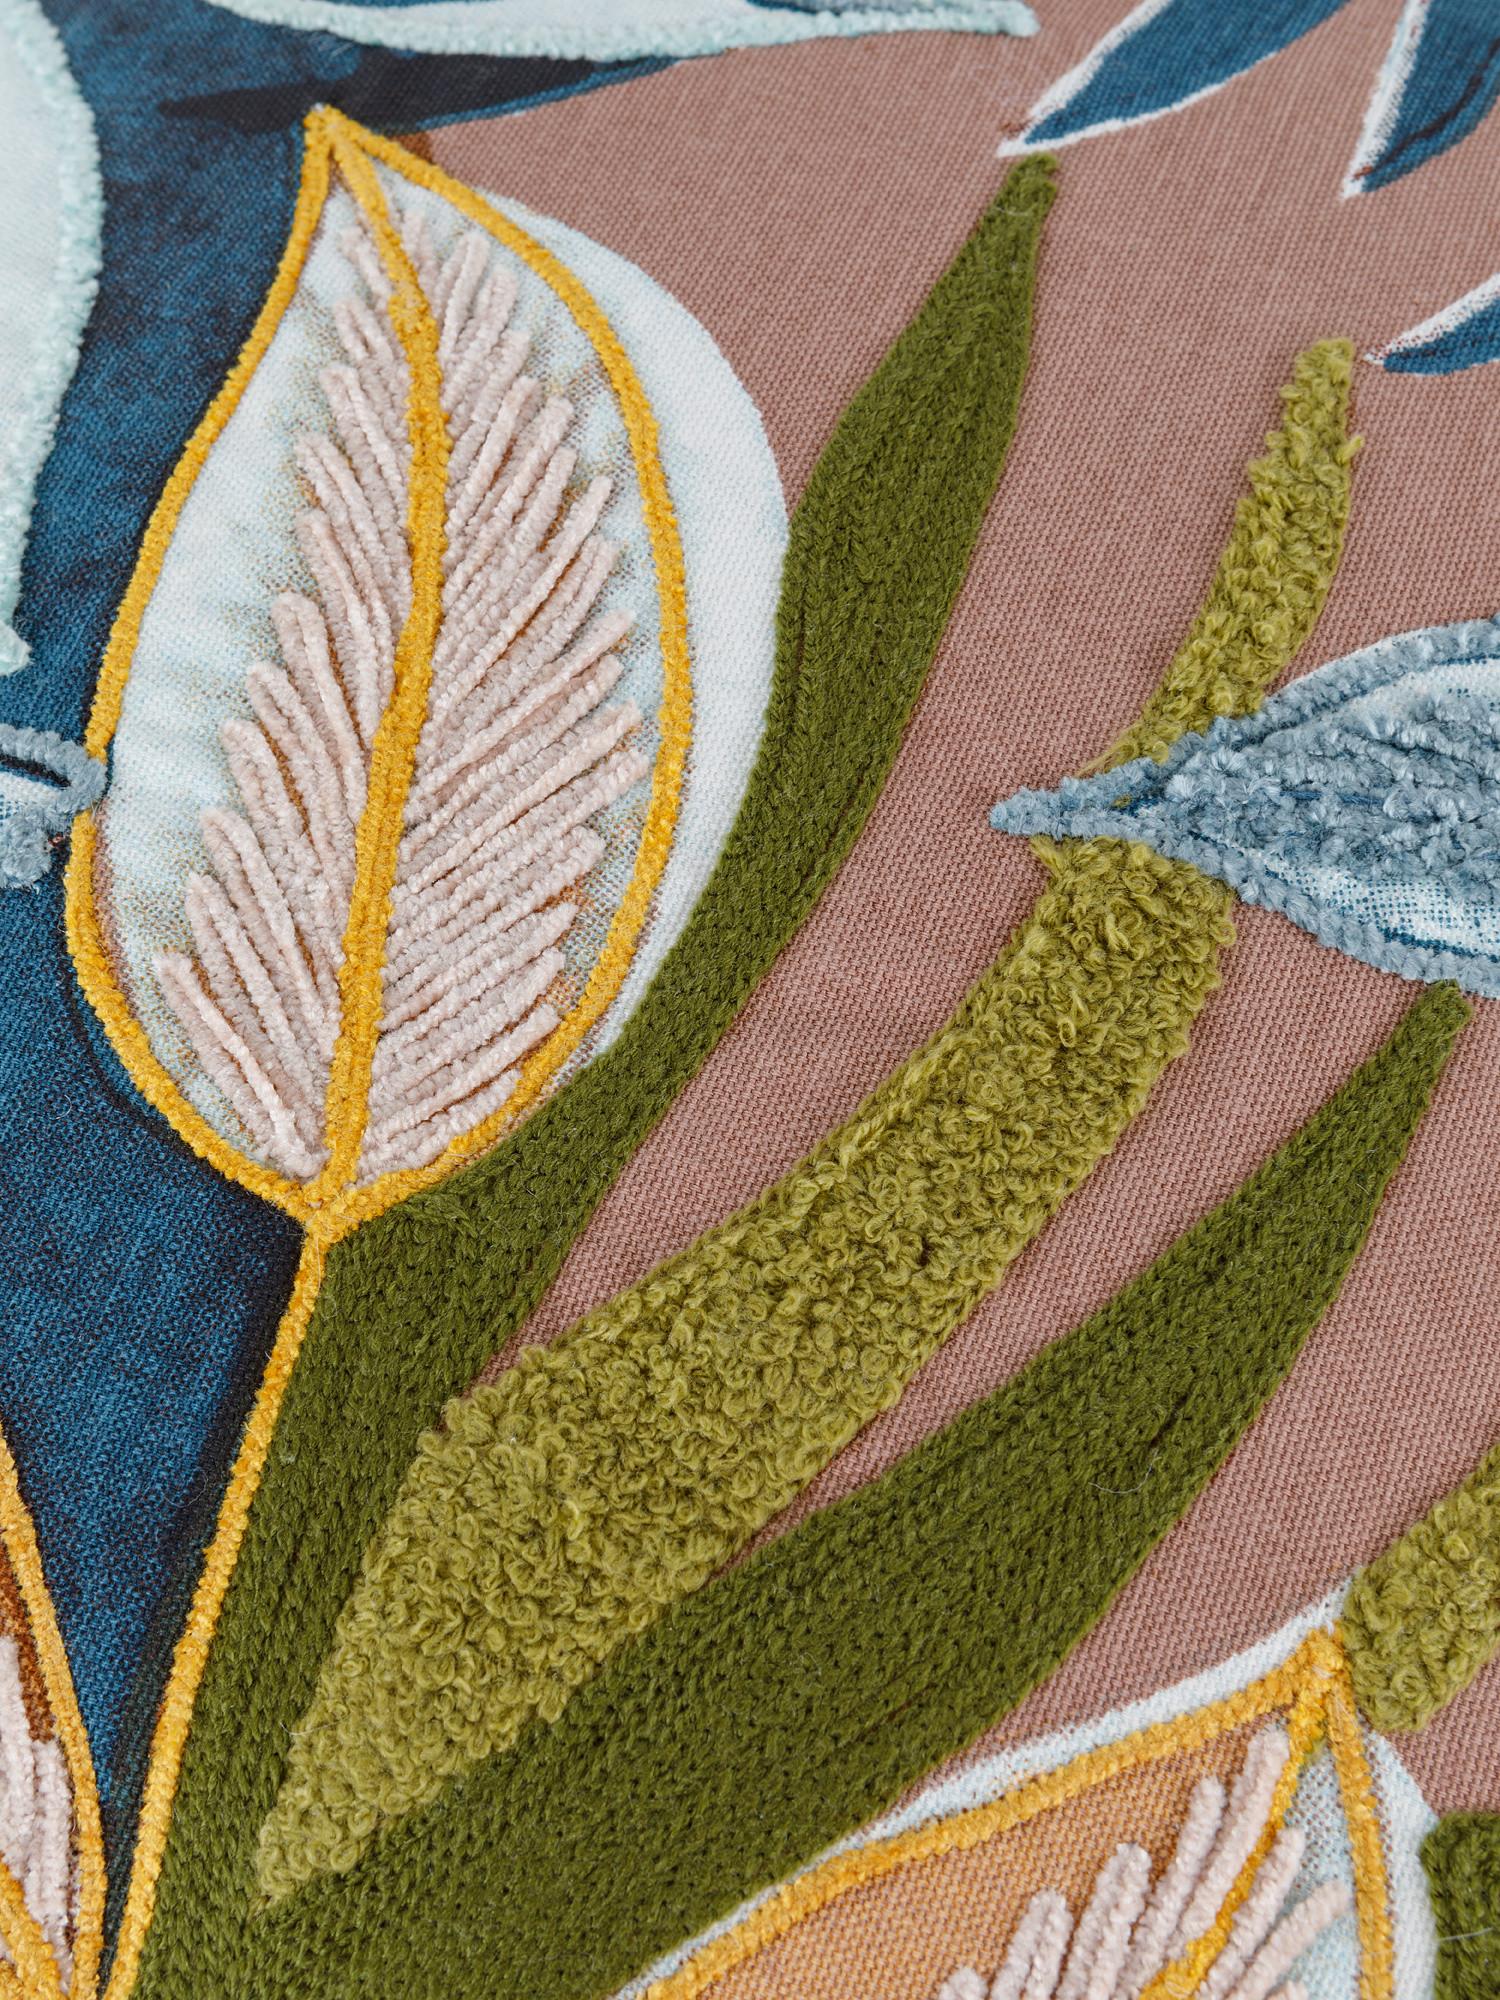 Cuscino cotone ricamo piante 45x45cm, Multicolor, large image number 2